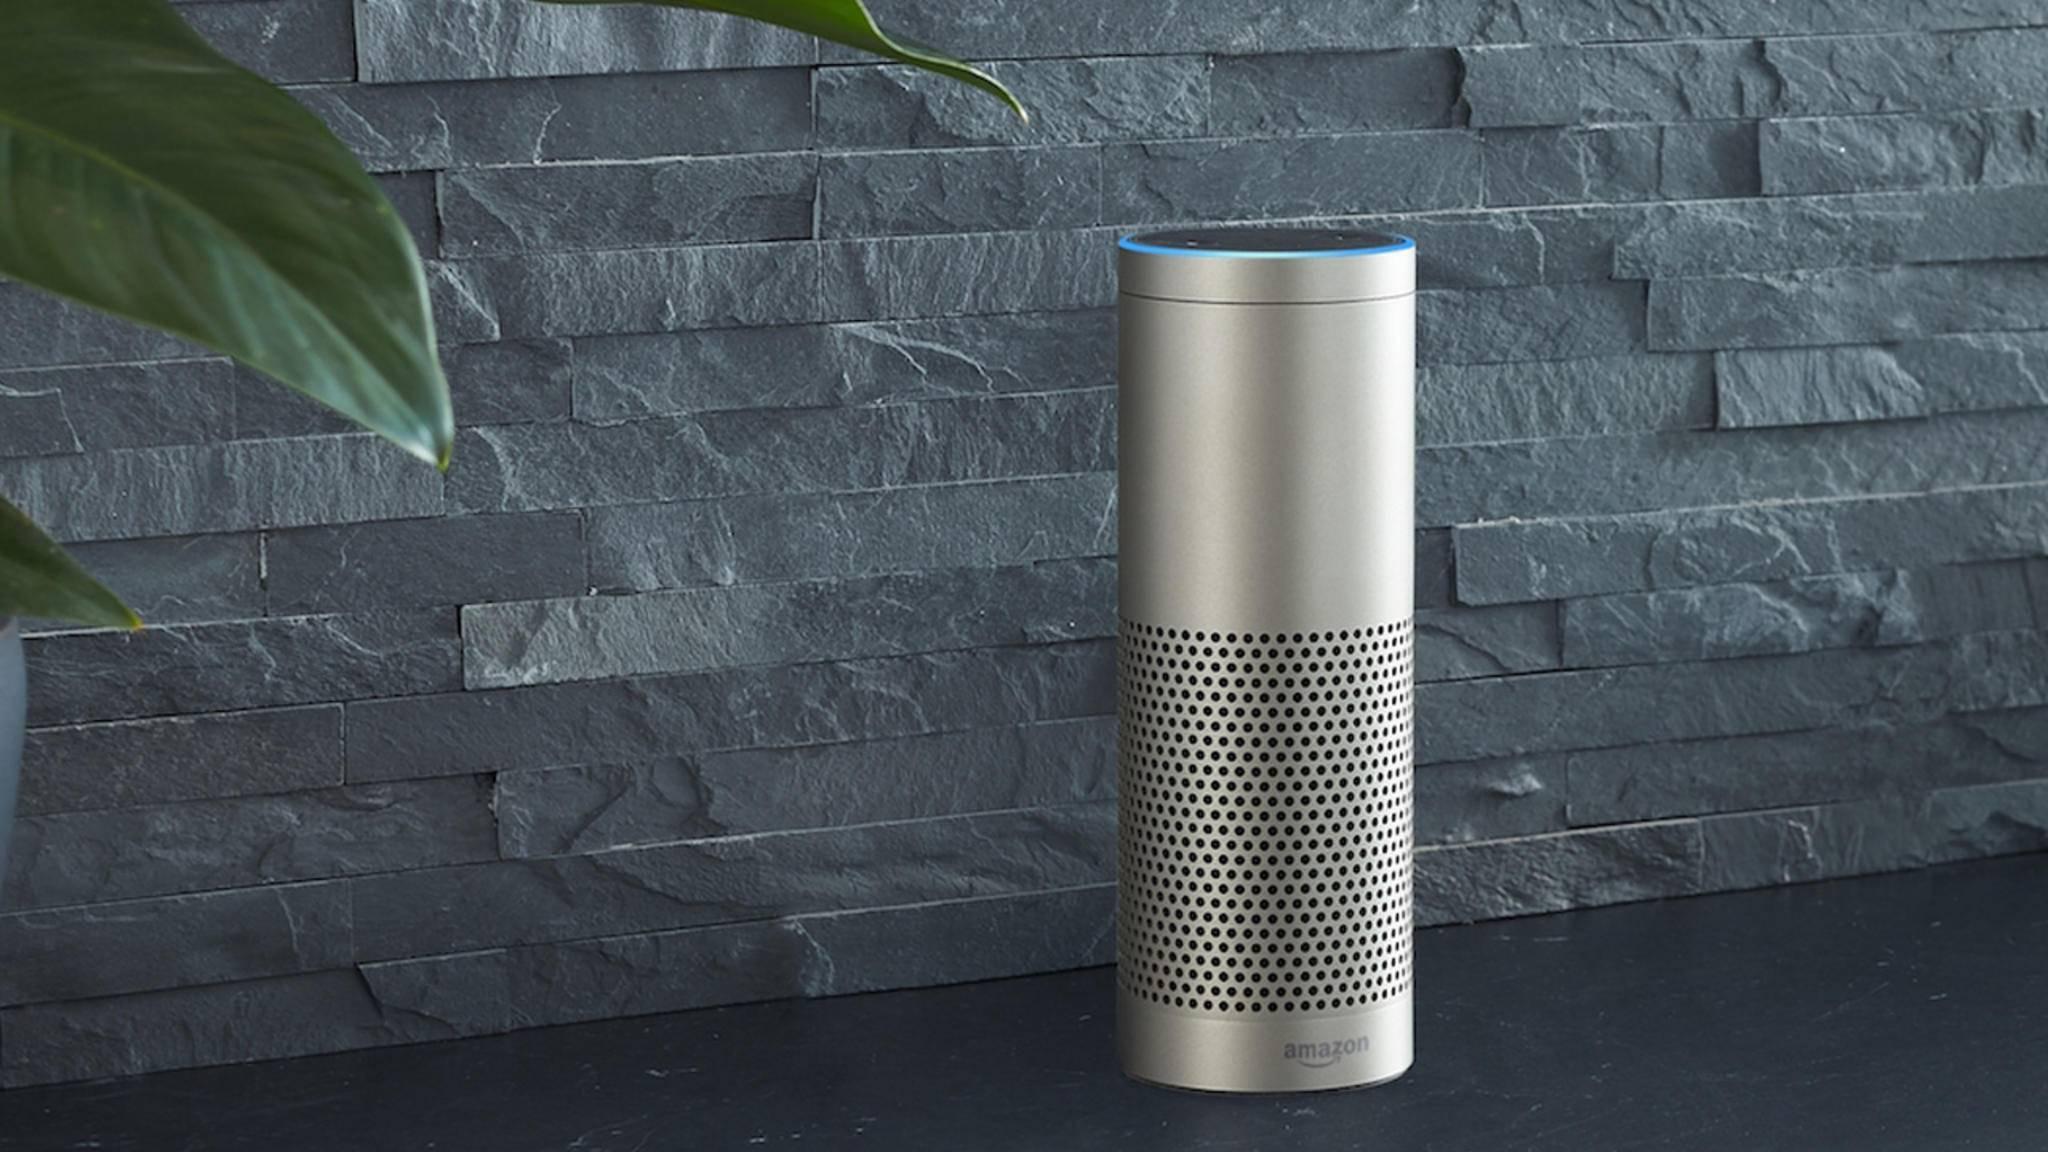 Amazon Echo Plus Kaufen